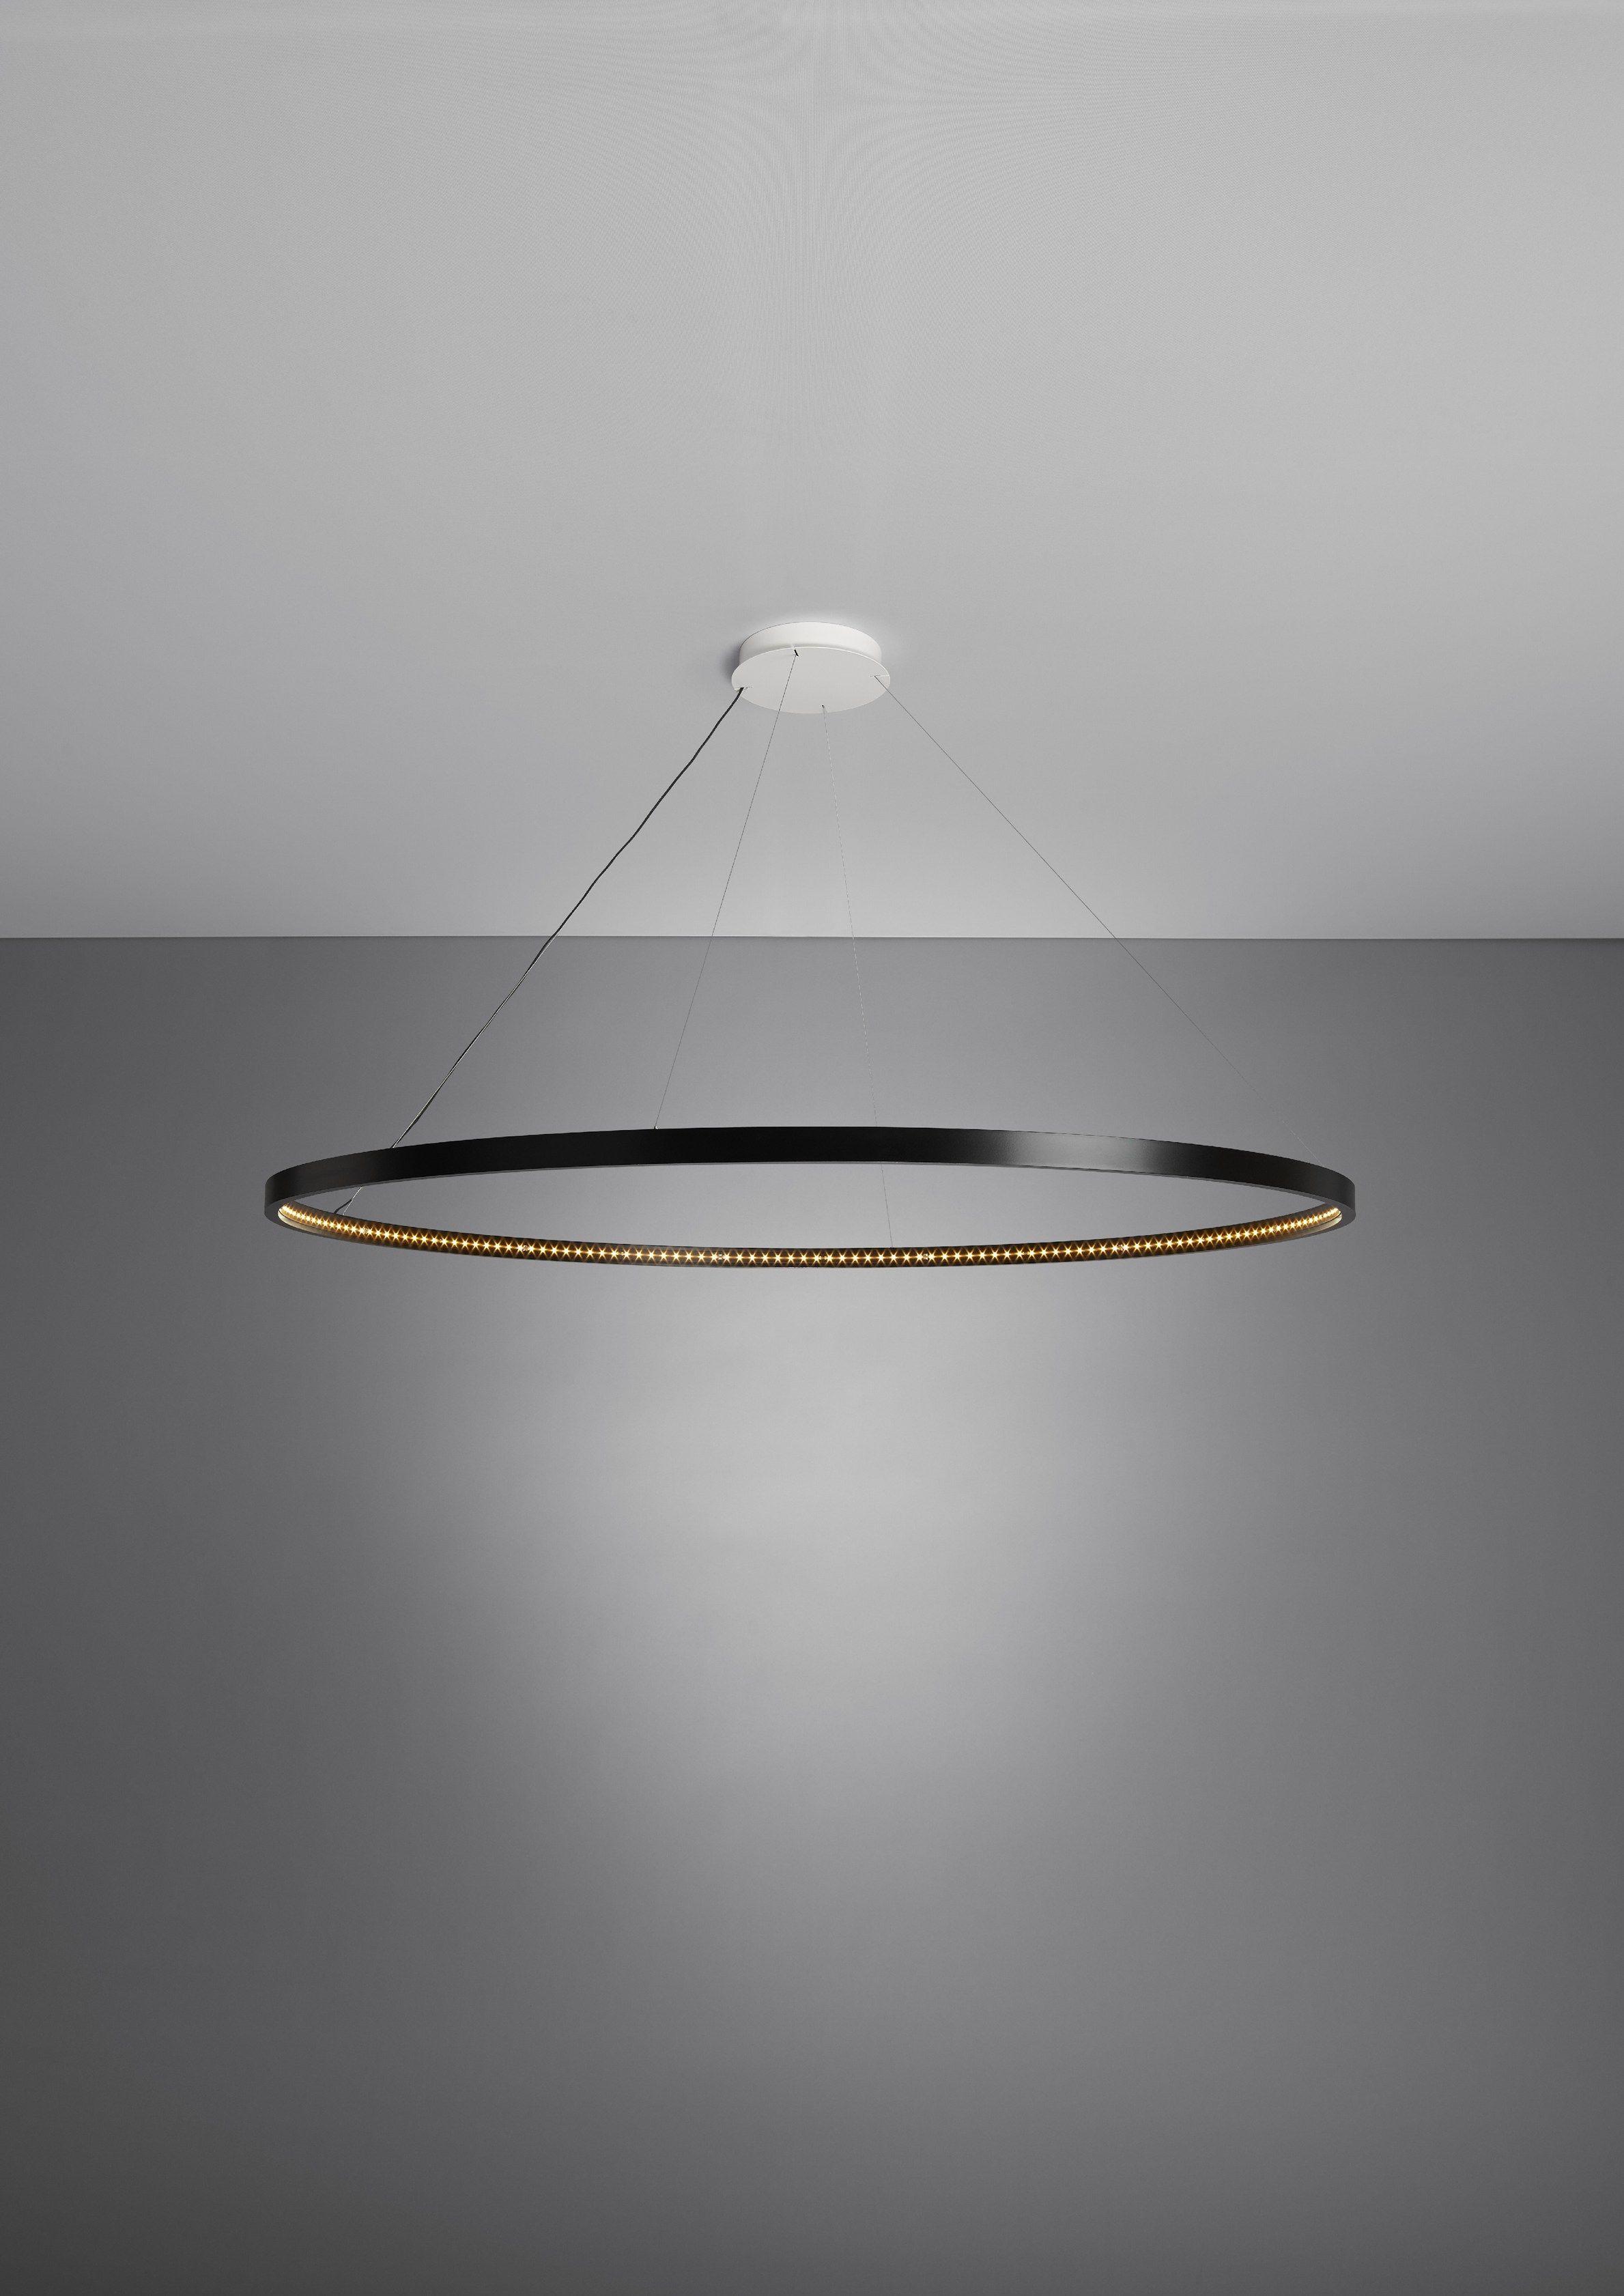 indirect lighting design. LED Direct-indirect Light Pendant Lamp OMEGA 120 - Le Deun Luminaires Indirect Lighting Design E